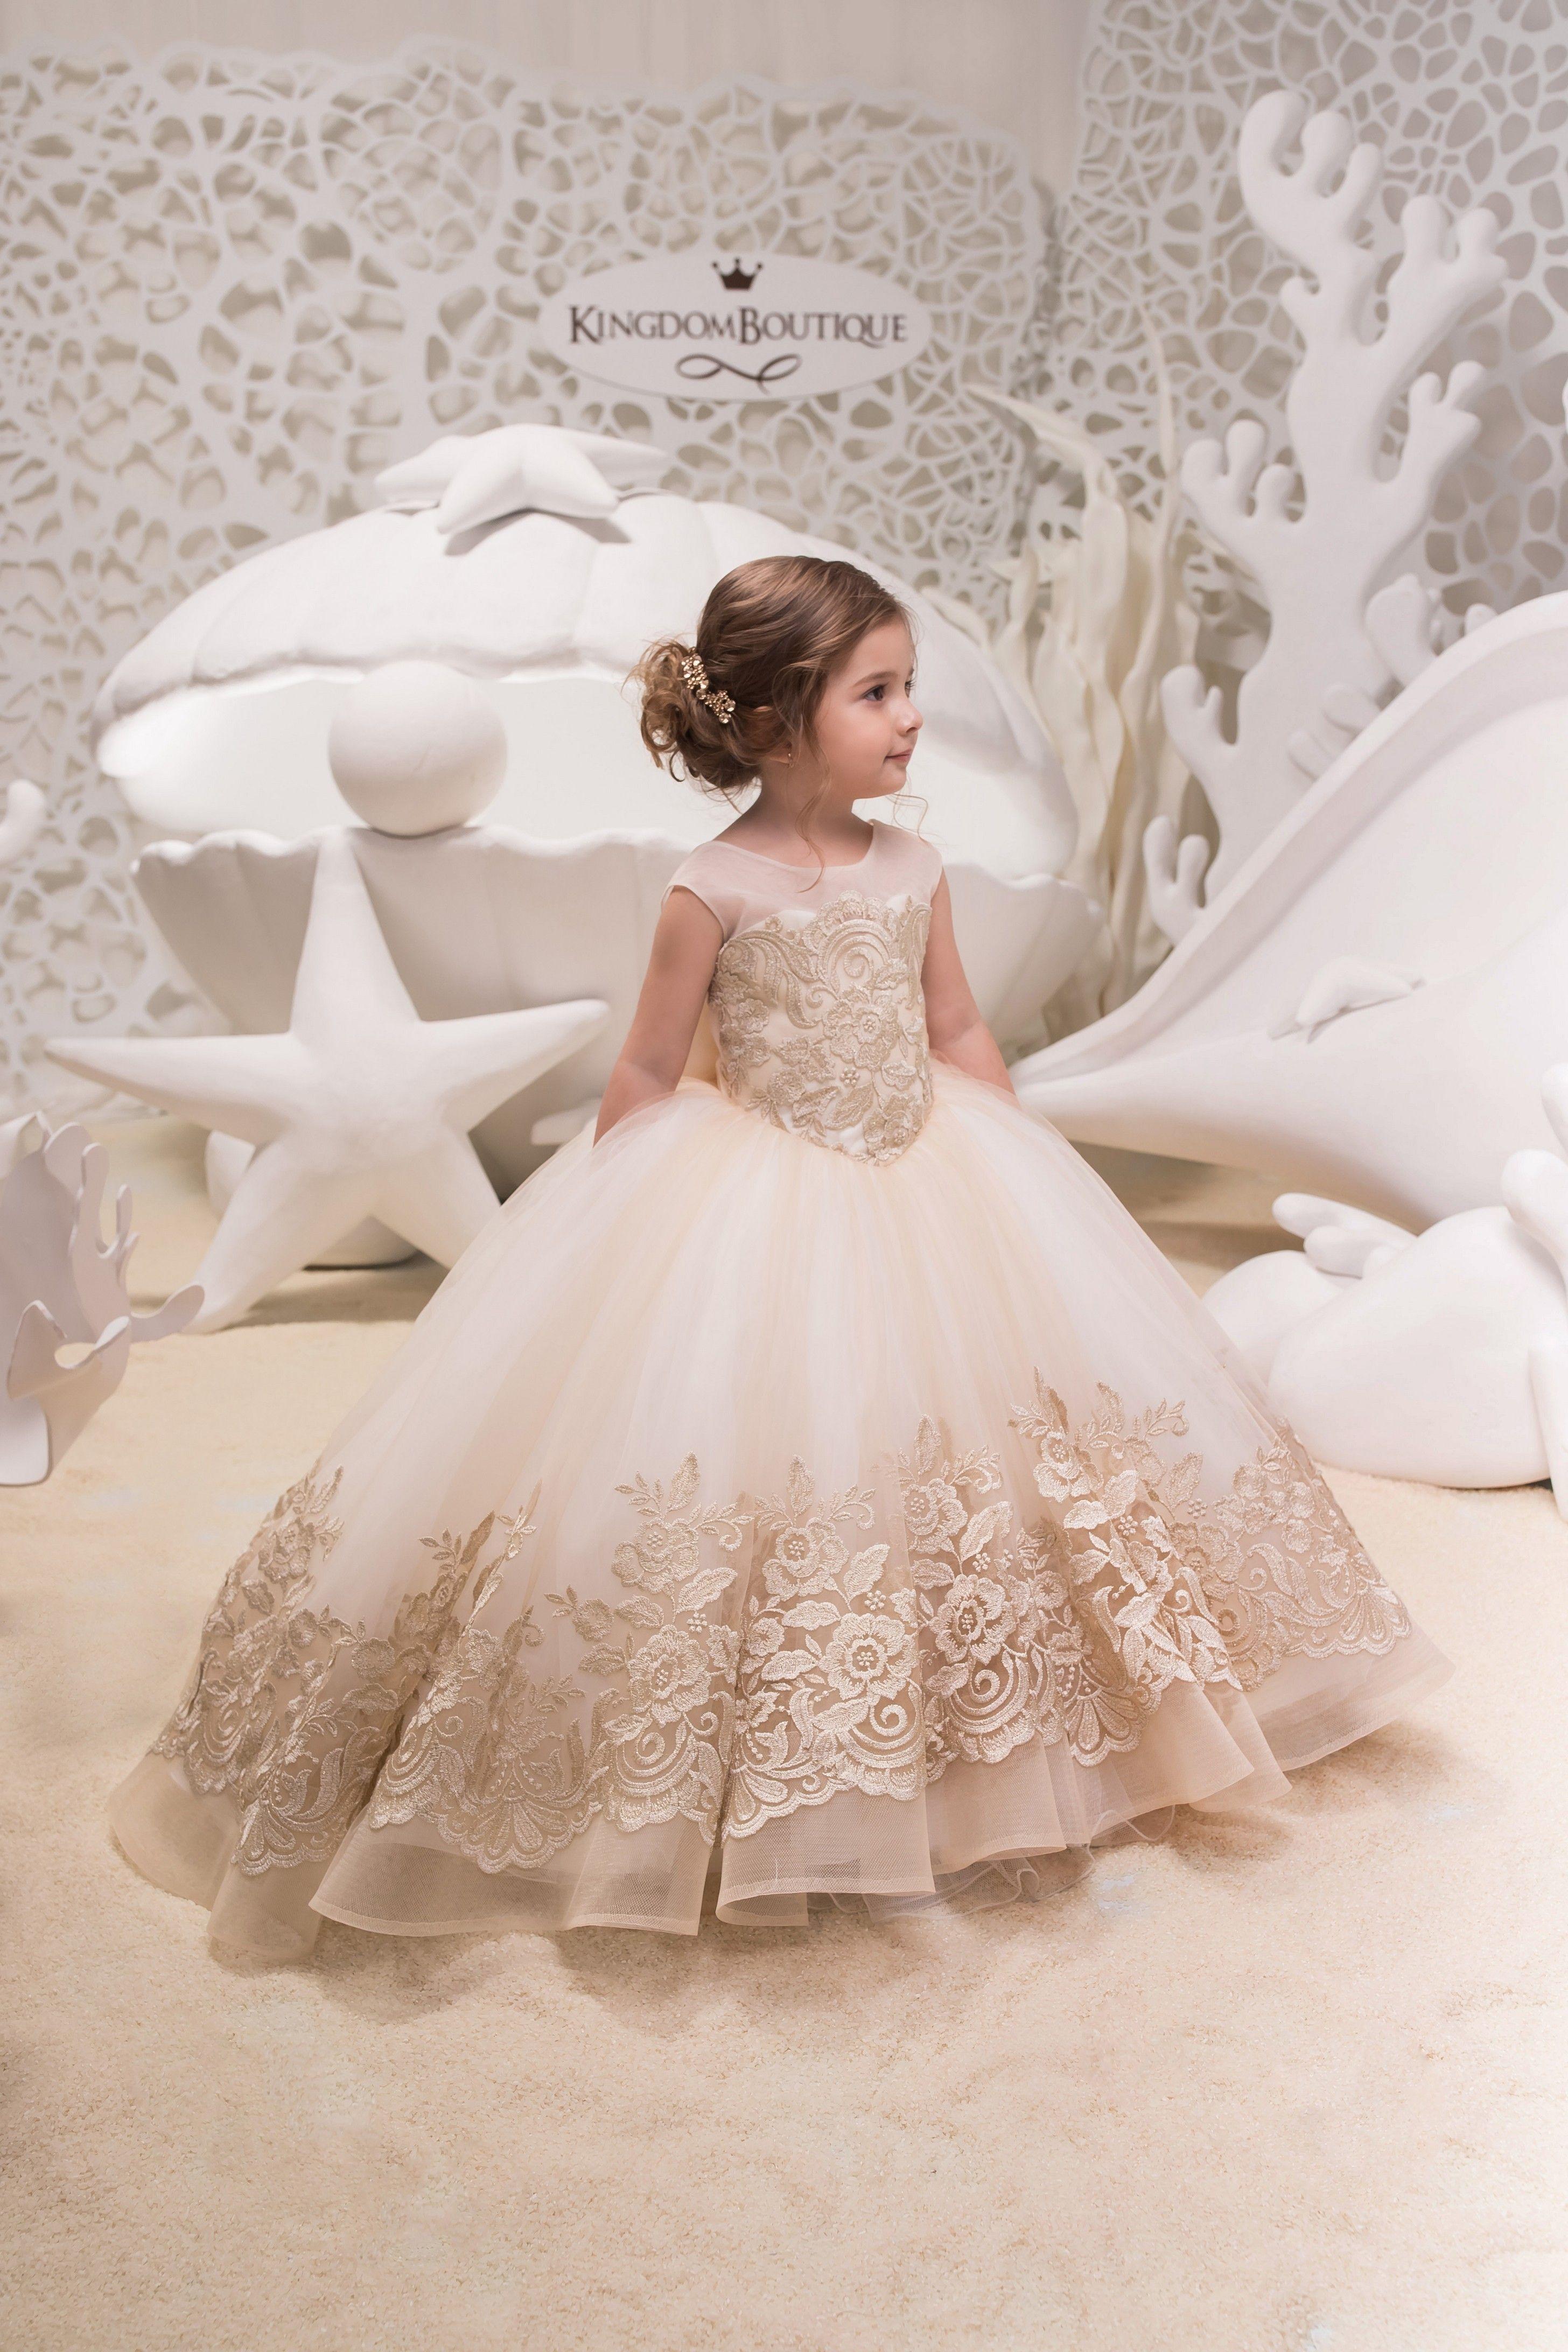 Kid Girl Tutu Tulle Dress Princess Cute Lace Flower Dresses Wedding Bridesmaid